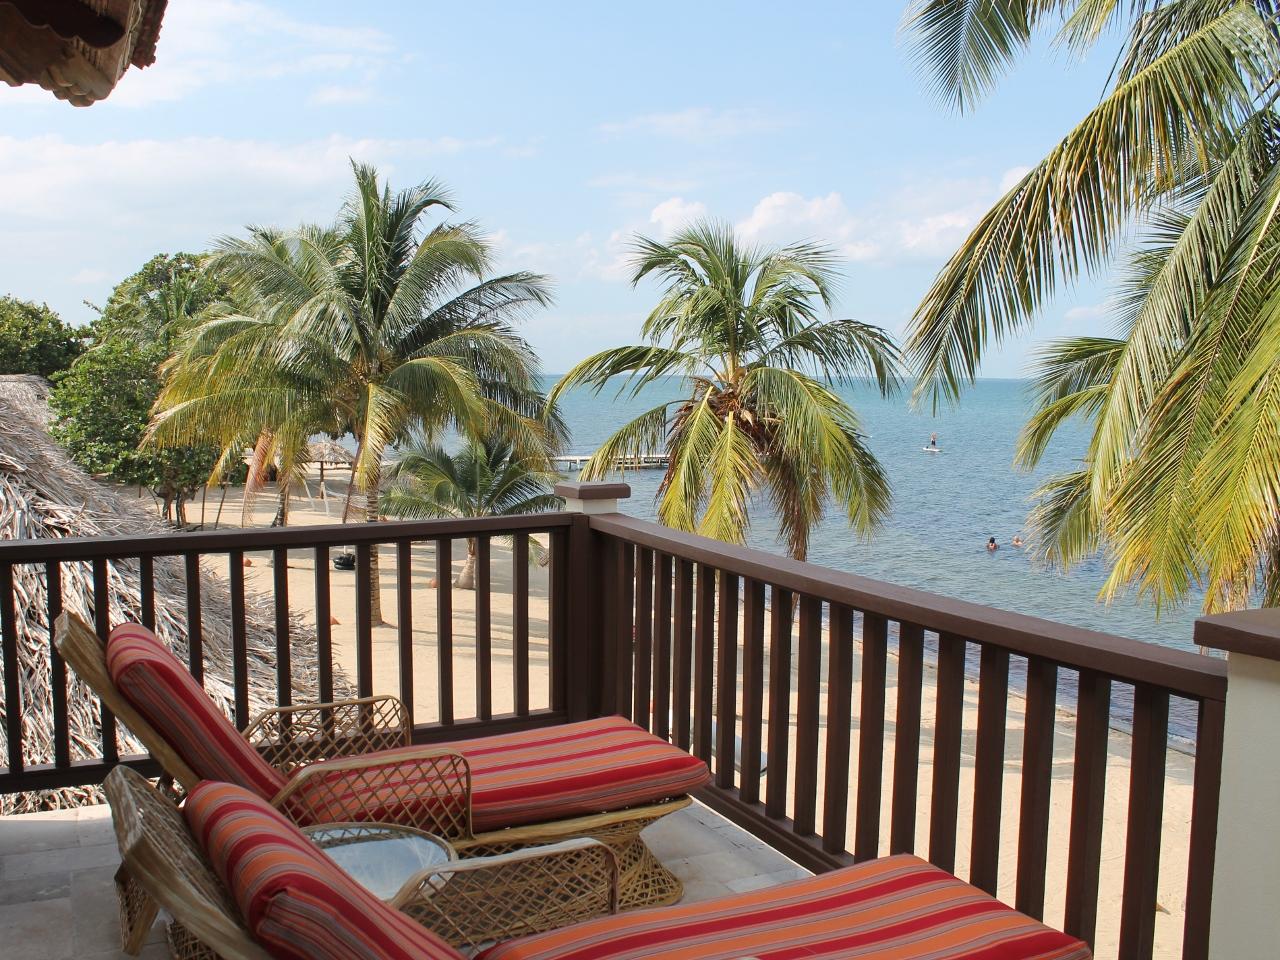 Almond Beach Resort, Hopkins, Belize